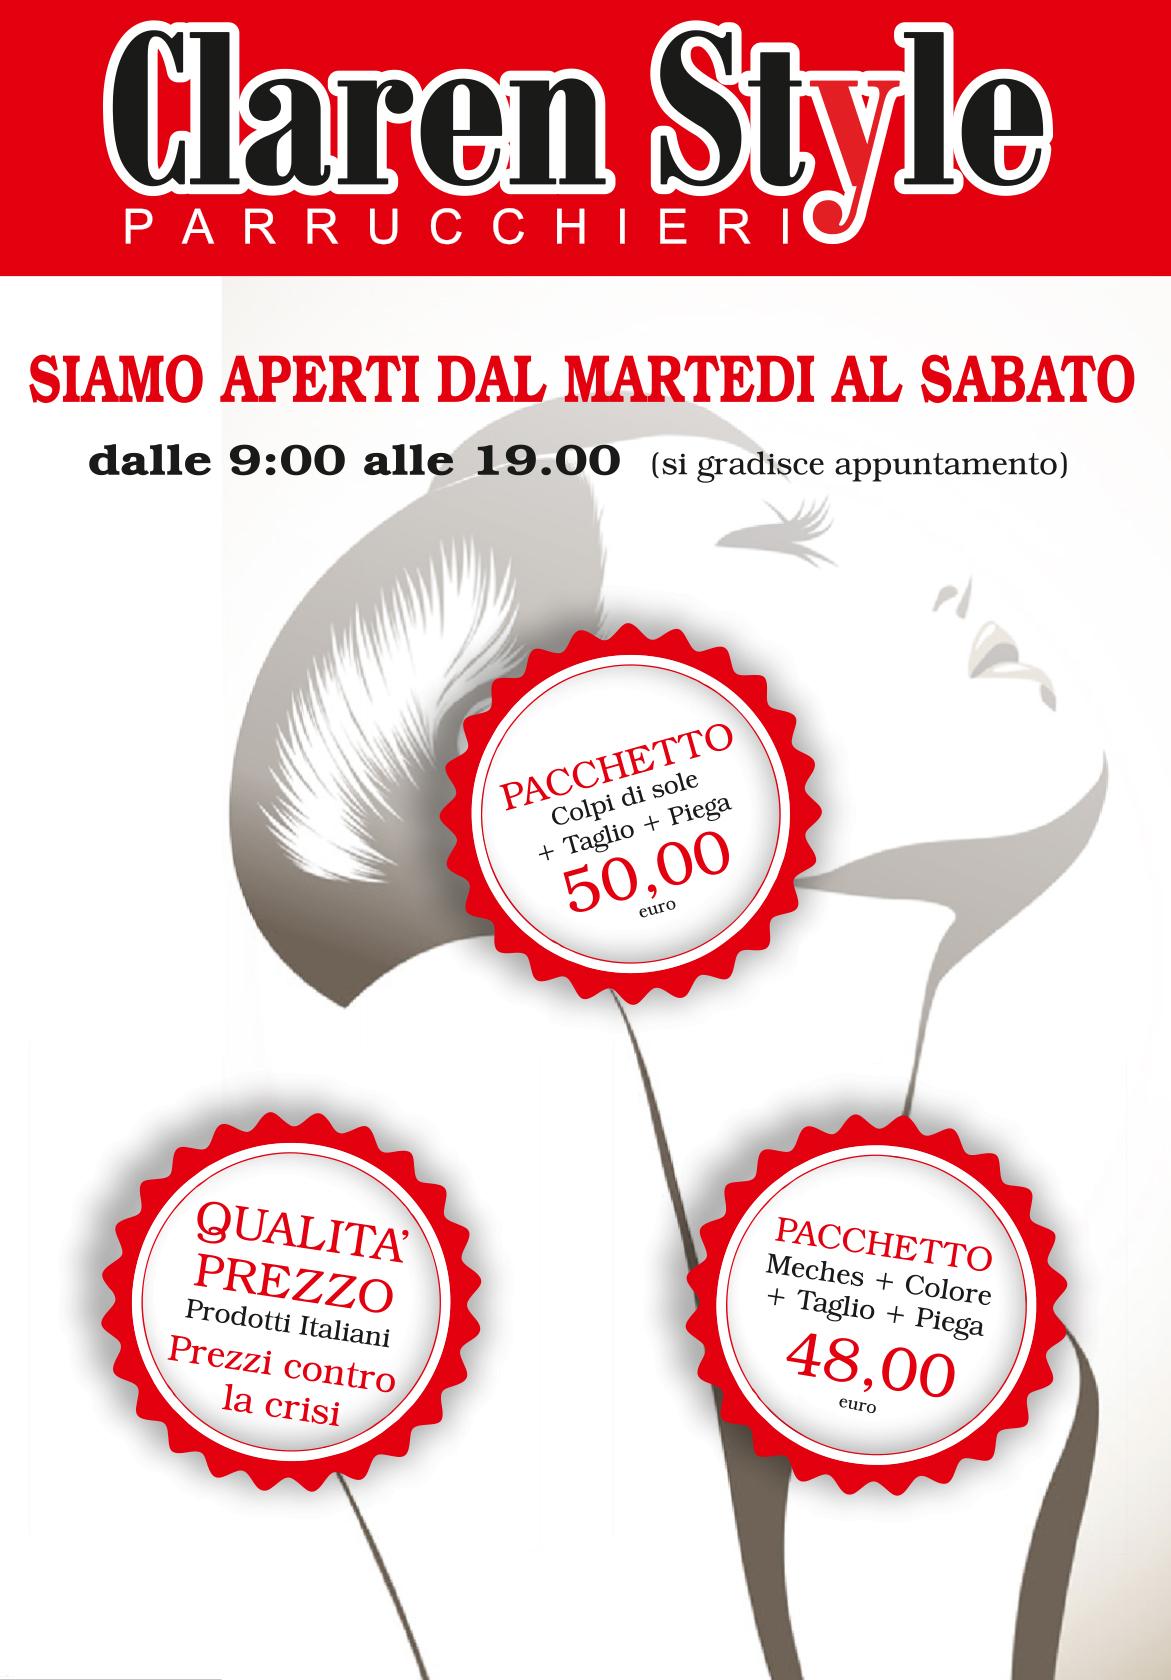 parrucchiere claren style roma nord promozioni